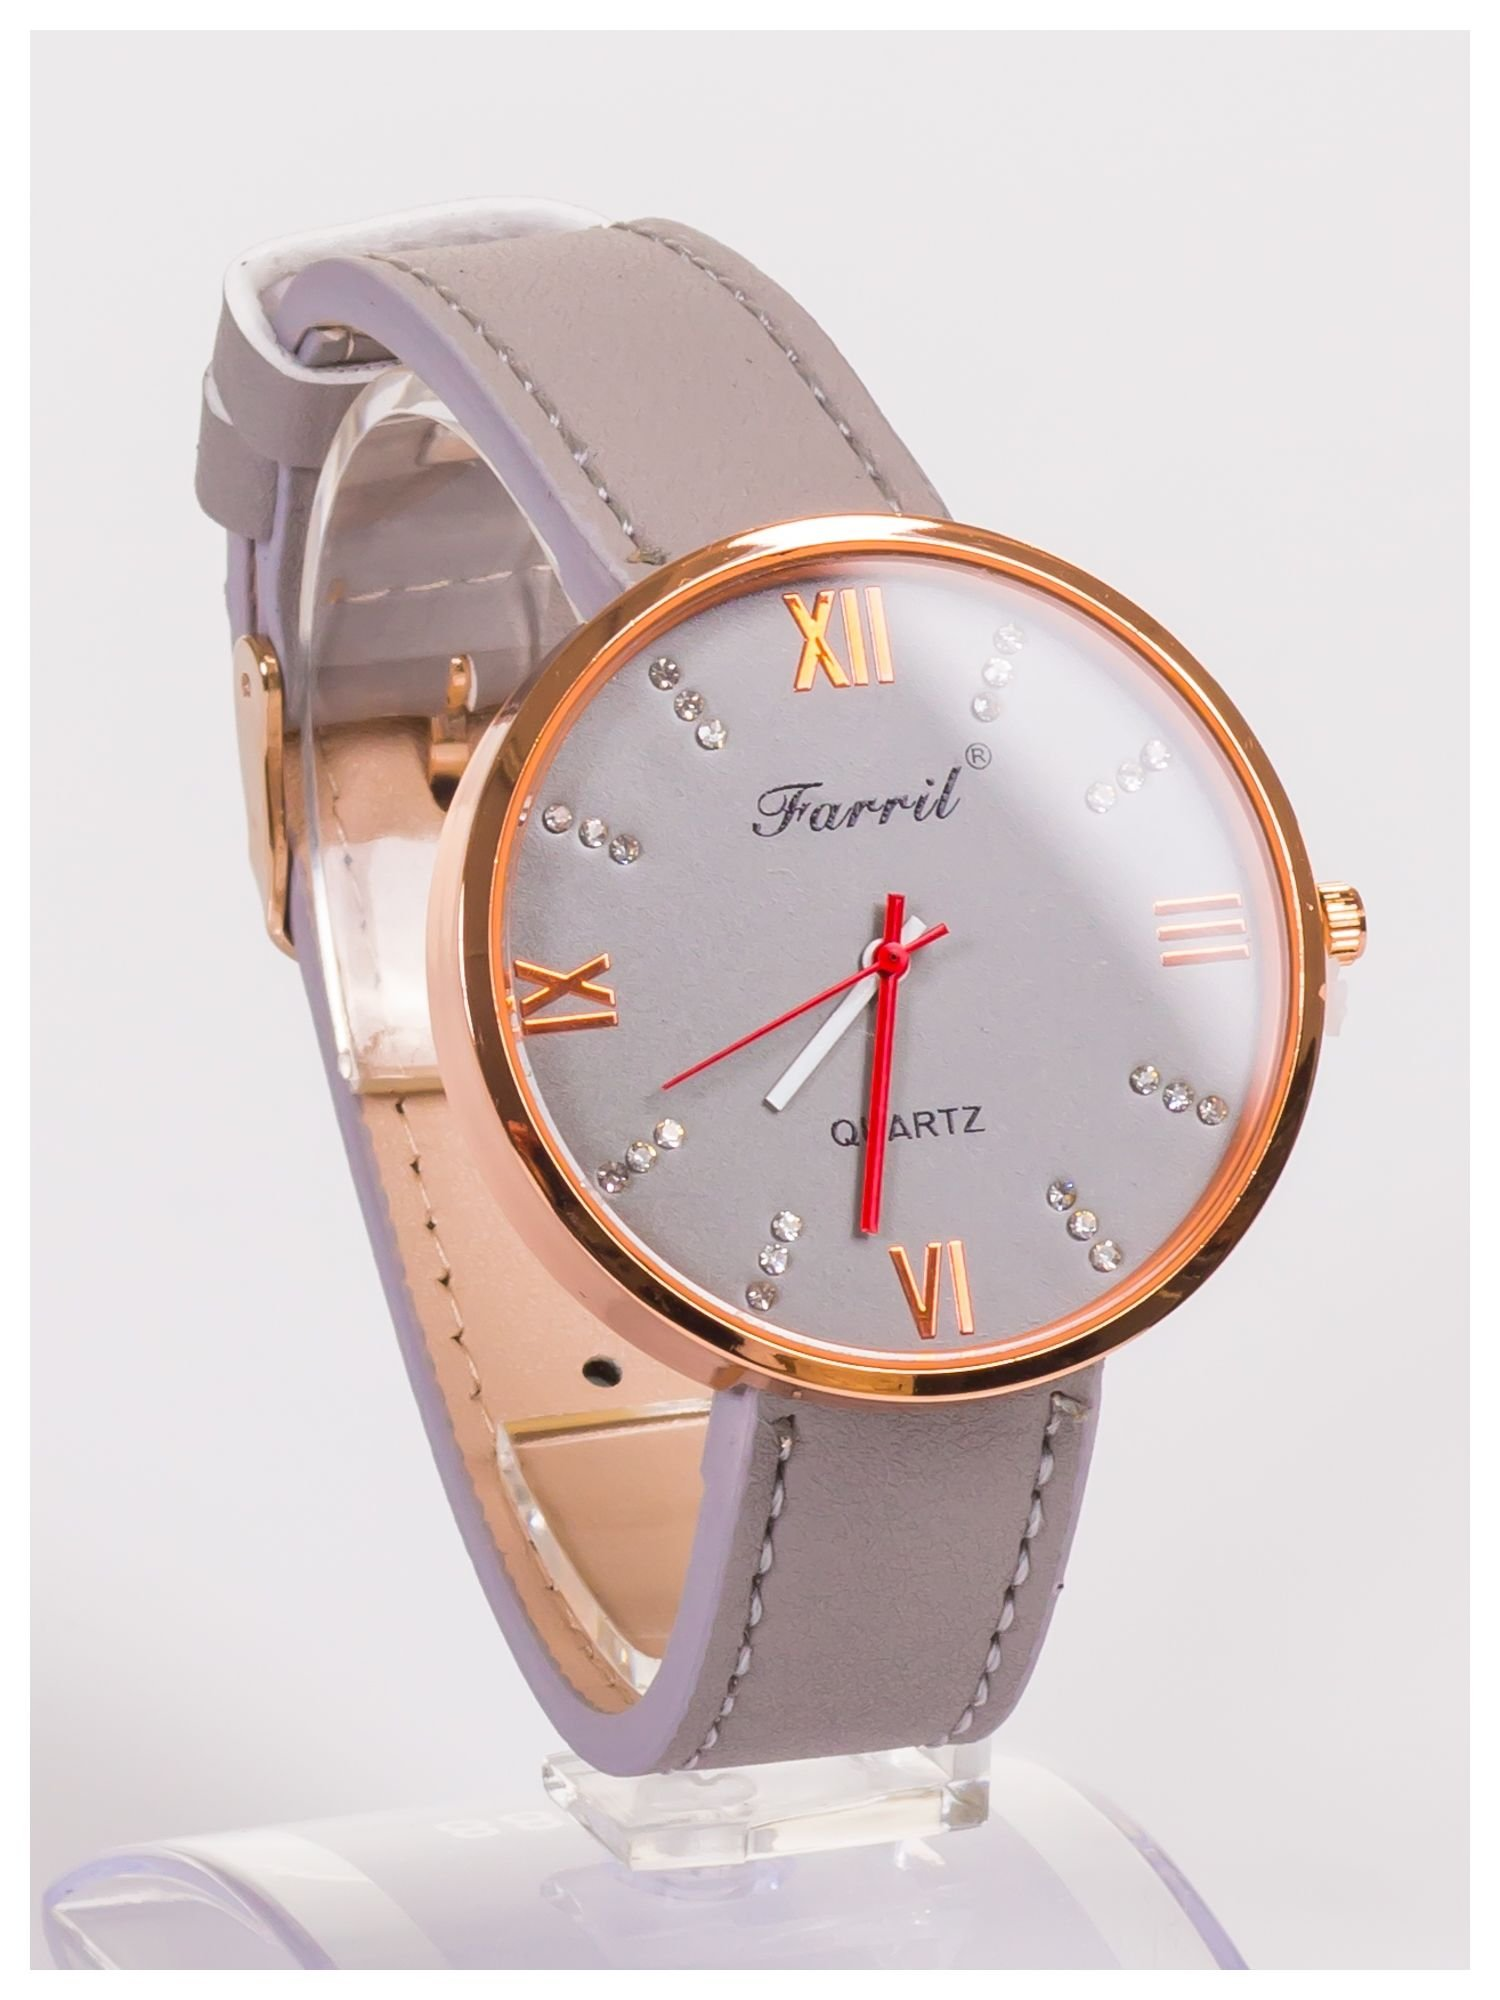 Farril -Klasyka i elegancja szary damski zegarek retro z cyrkoniami -Rose gold                                  zdj.                                  3